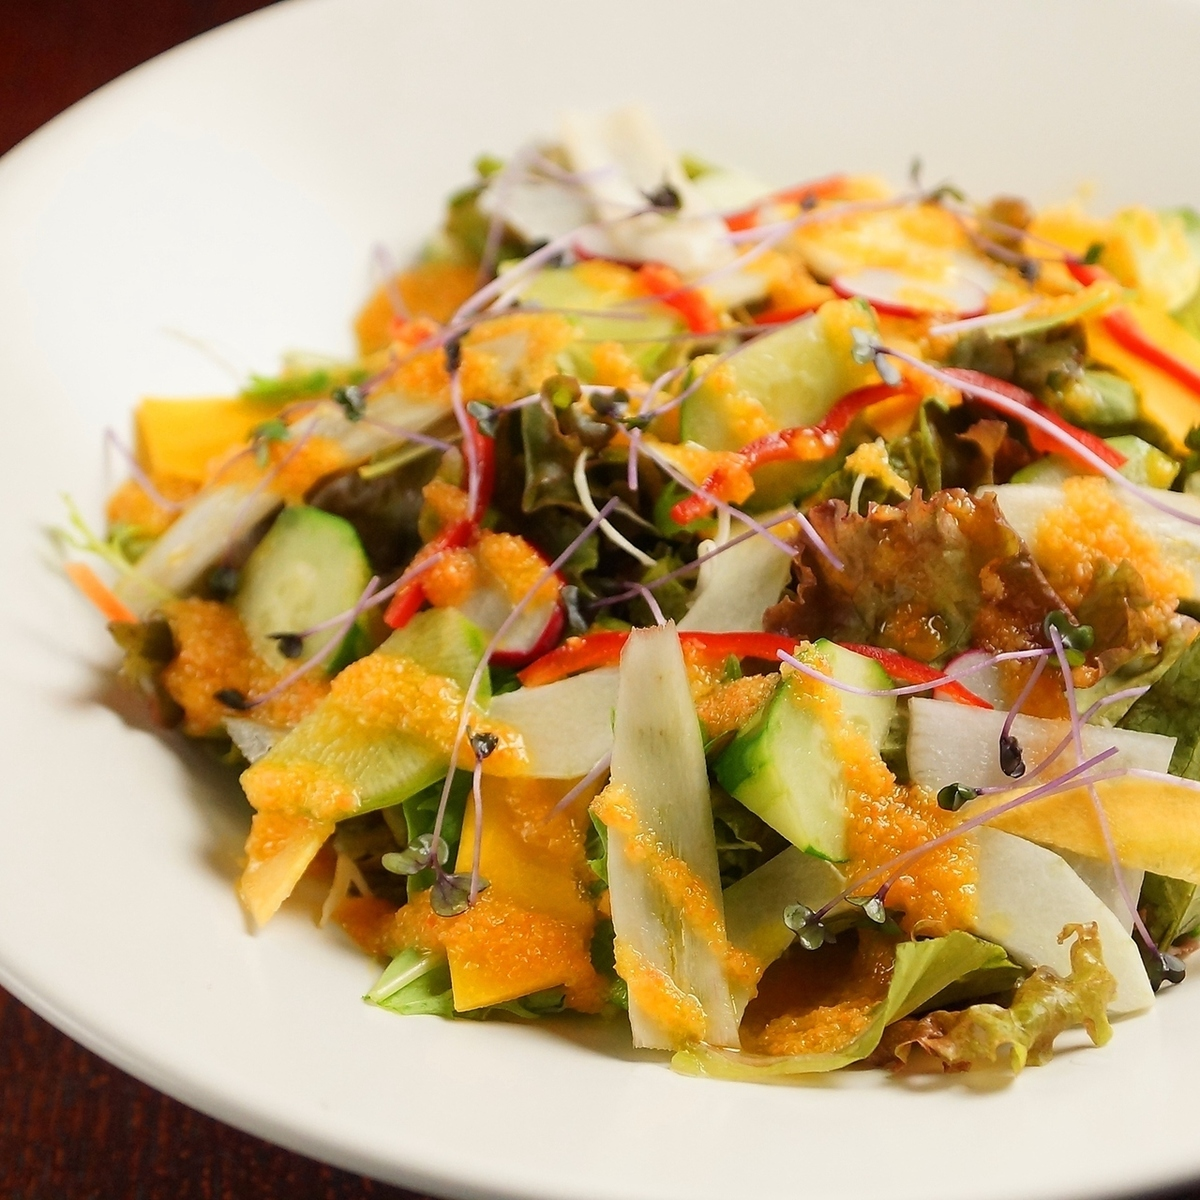 Osaka made vegetables plentiful Marche salad